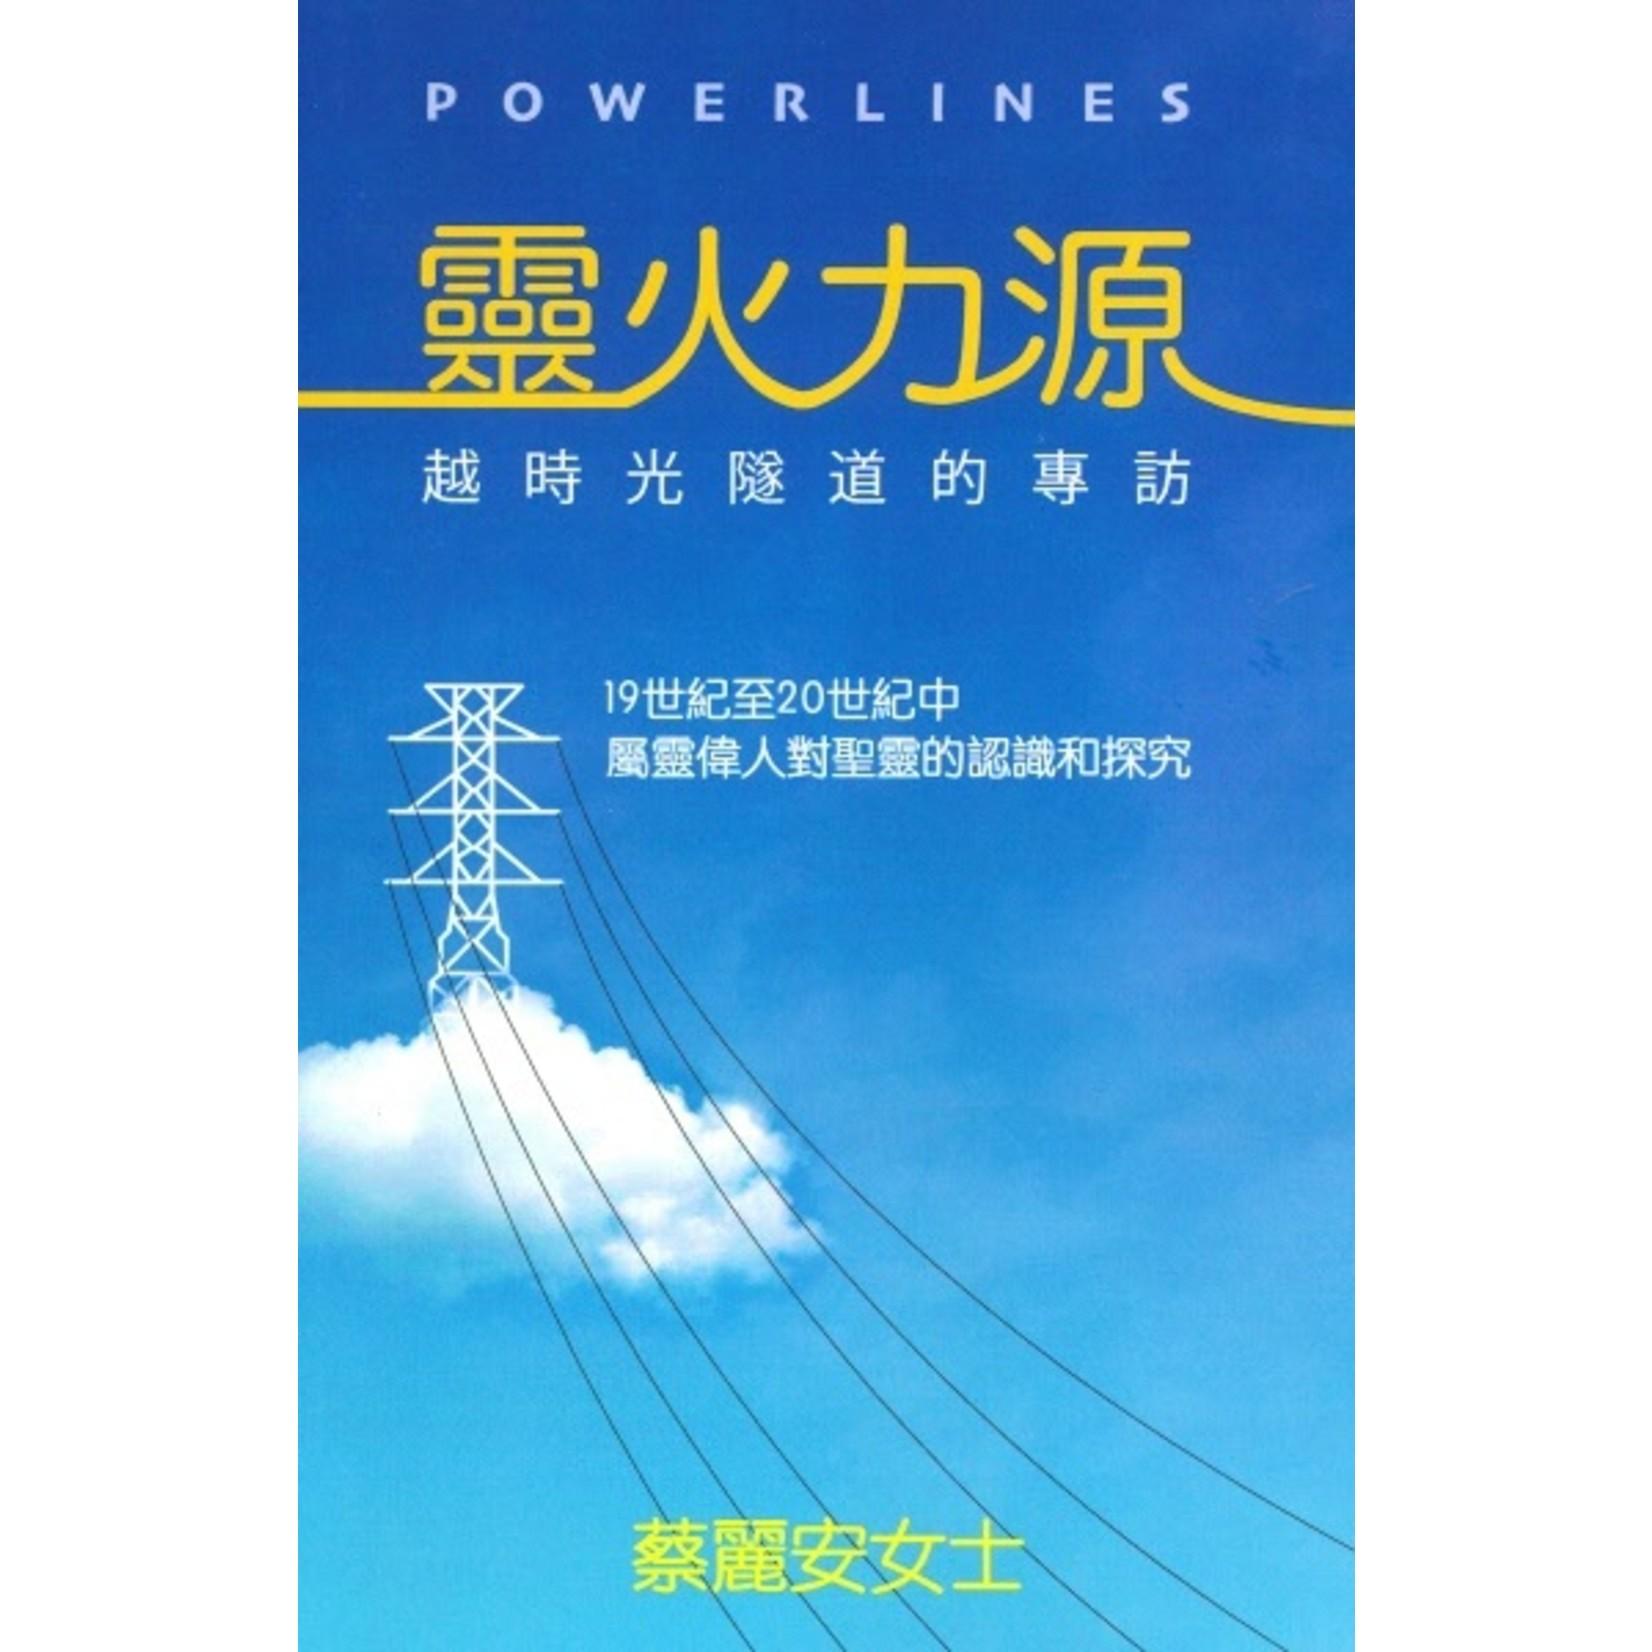 Golden Morning Publishing 靈火力源:越時光隧道的專訪 Powerlines